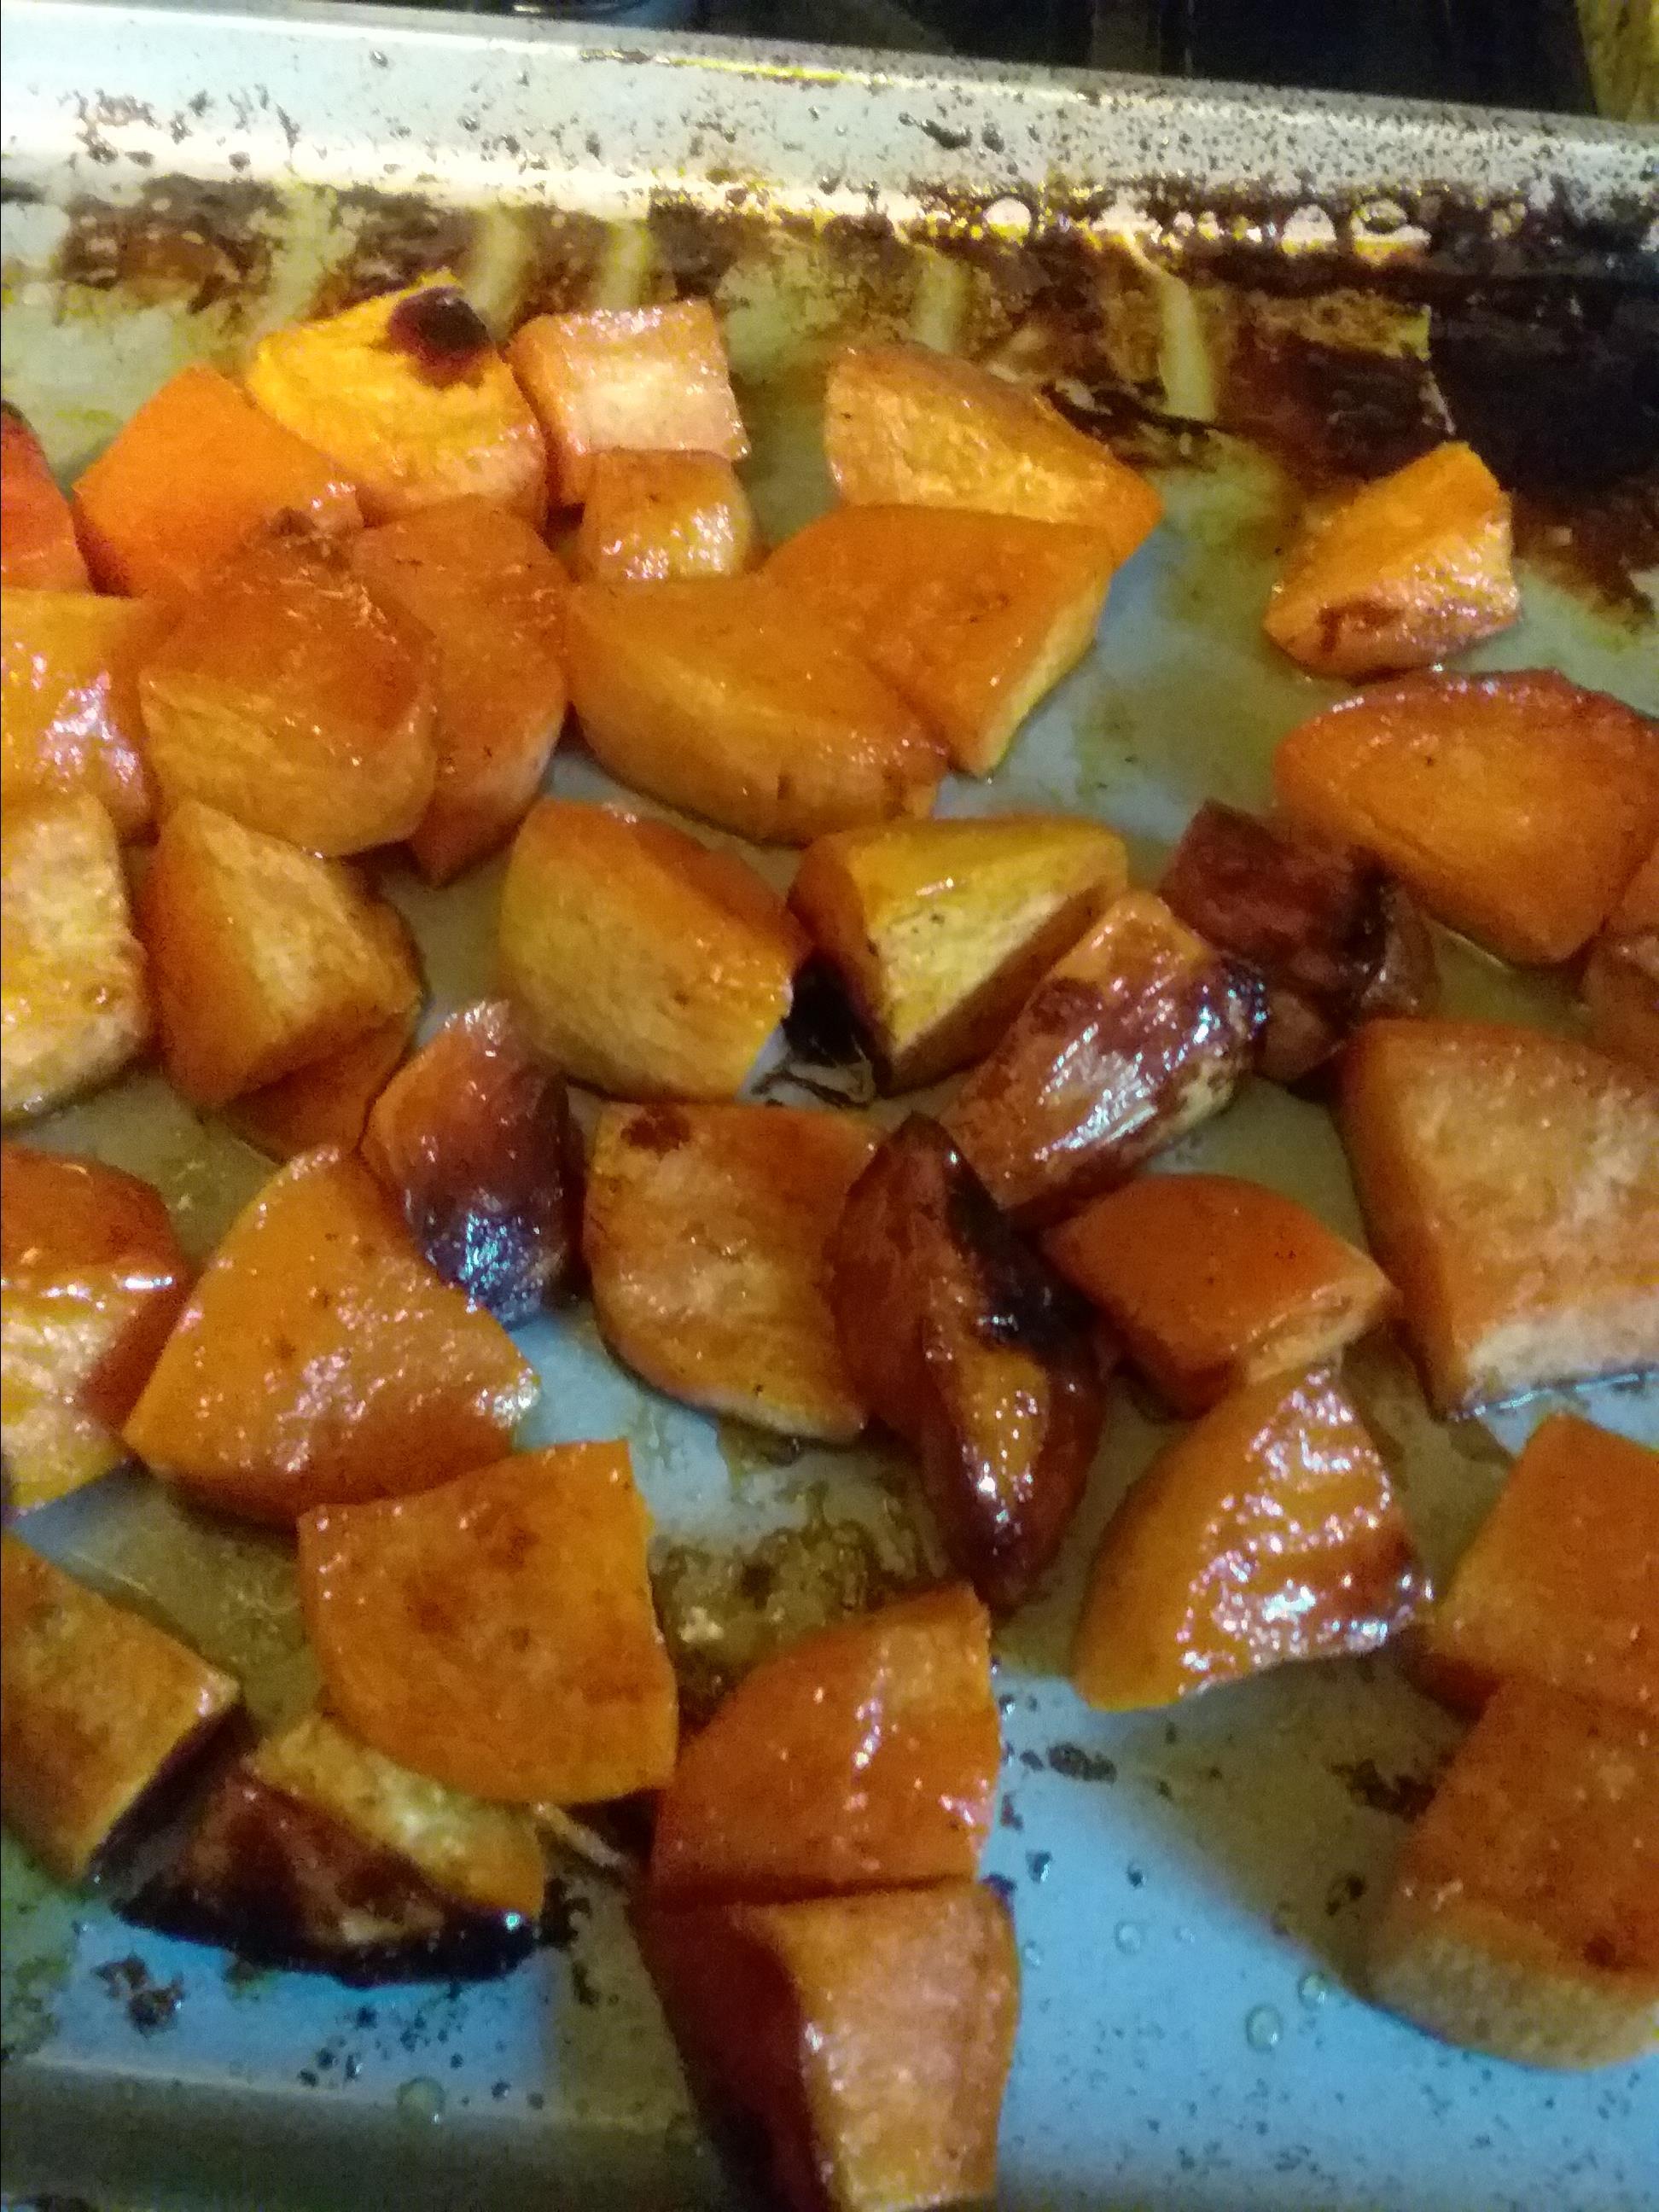 Honey Roasted Sweet Potatoes Mary Ann B